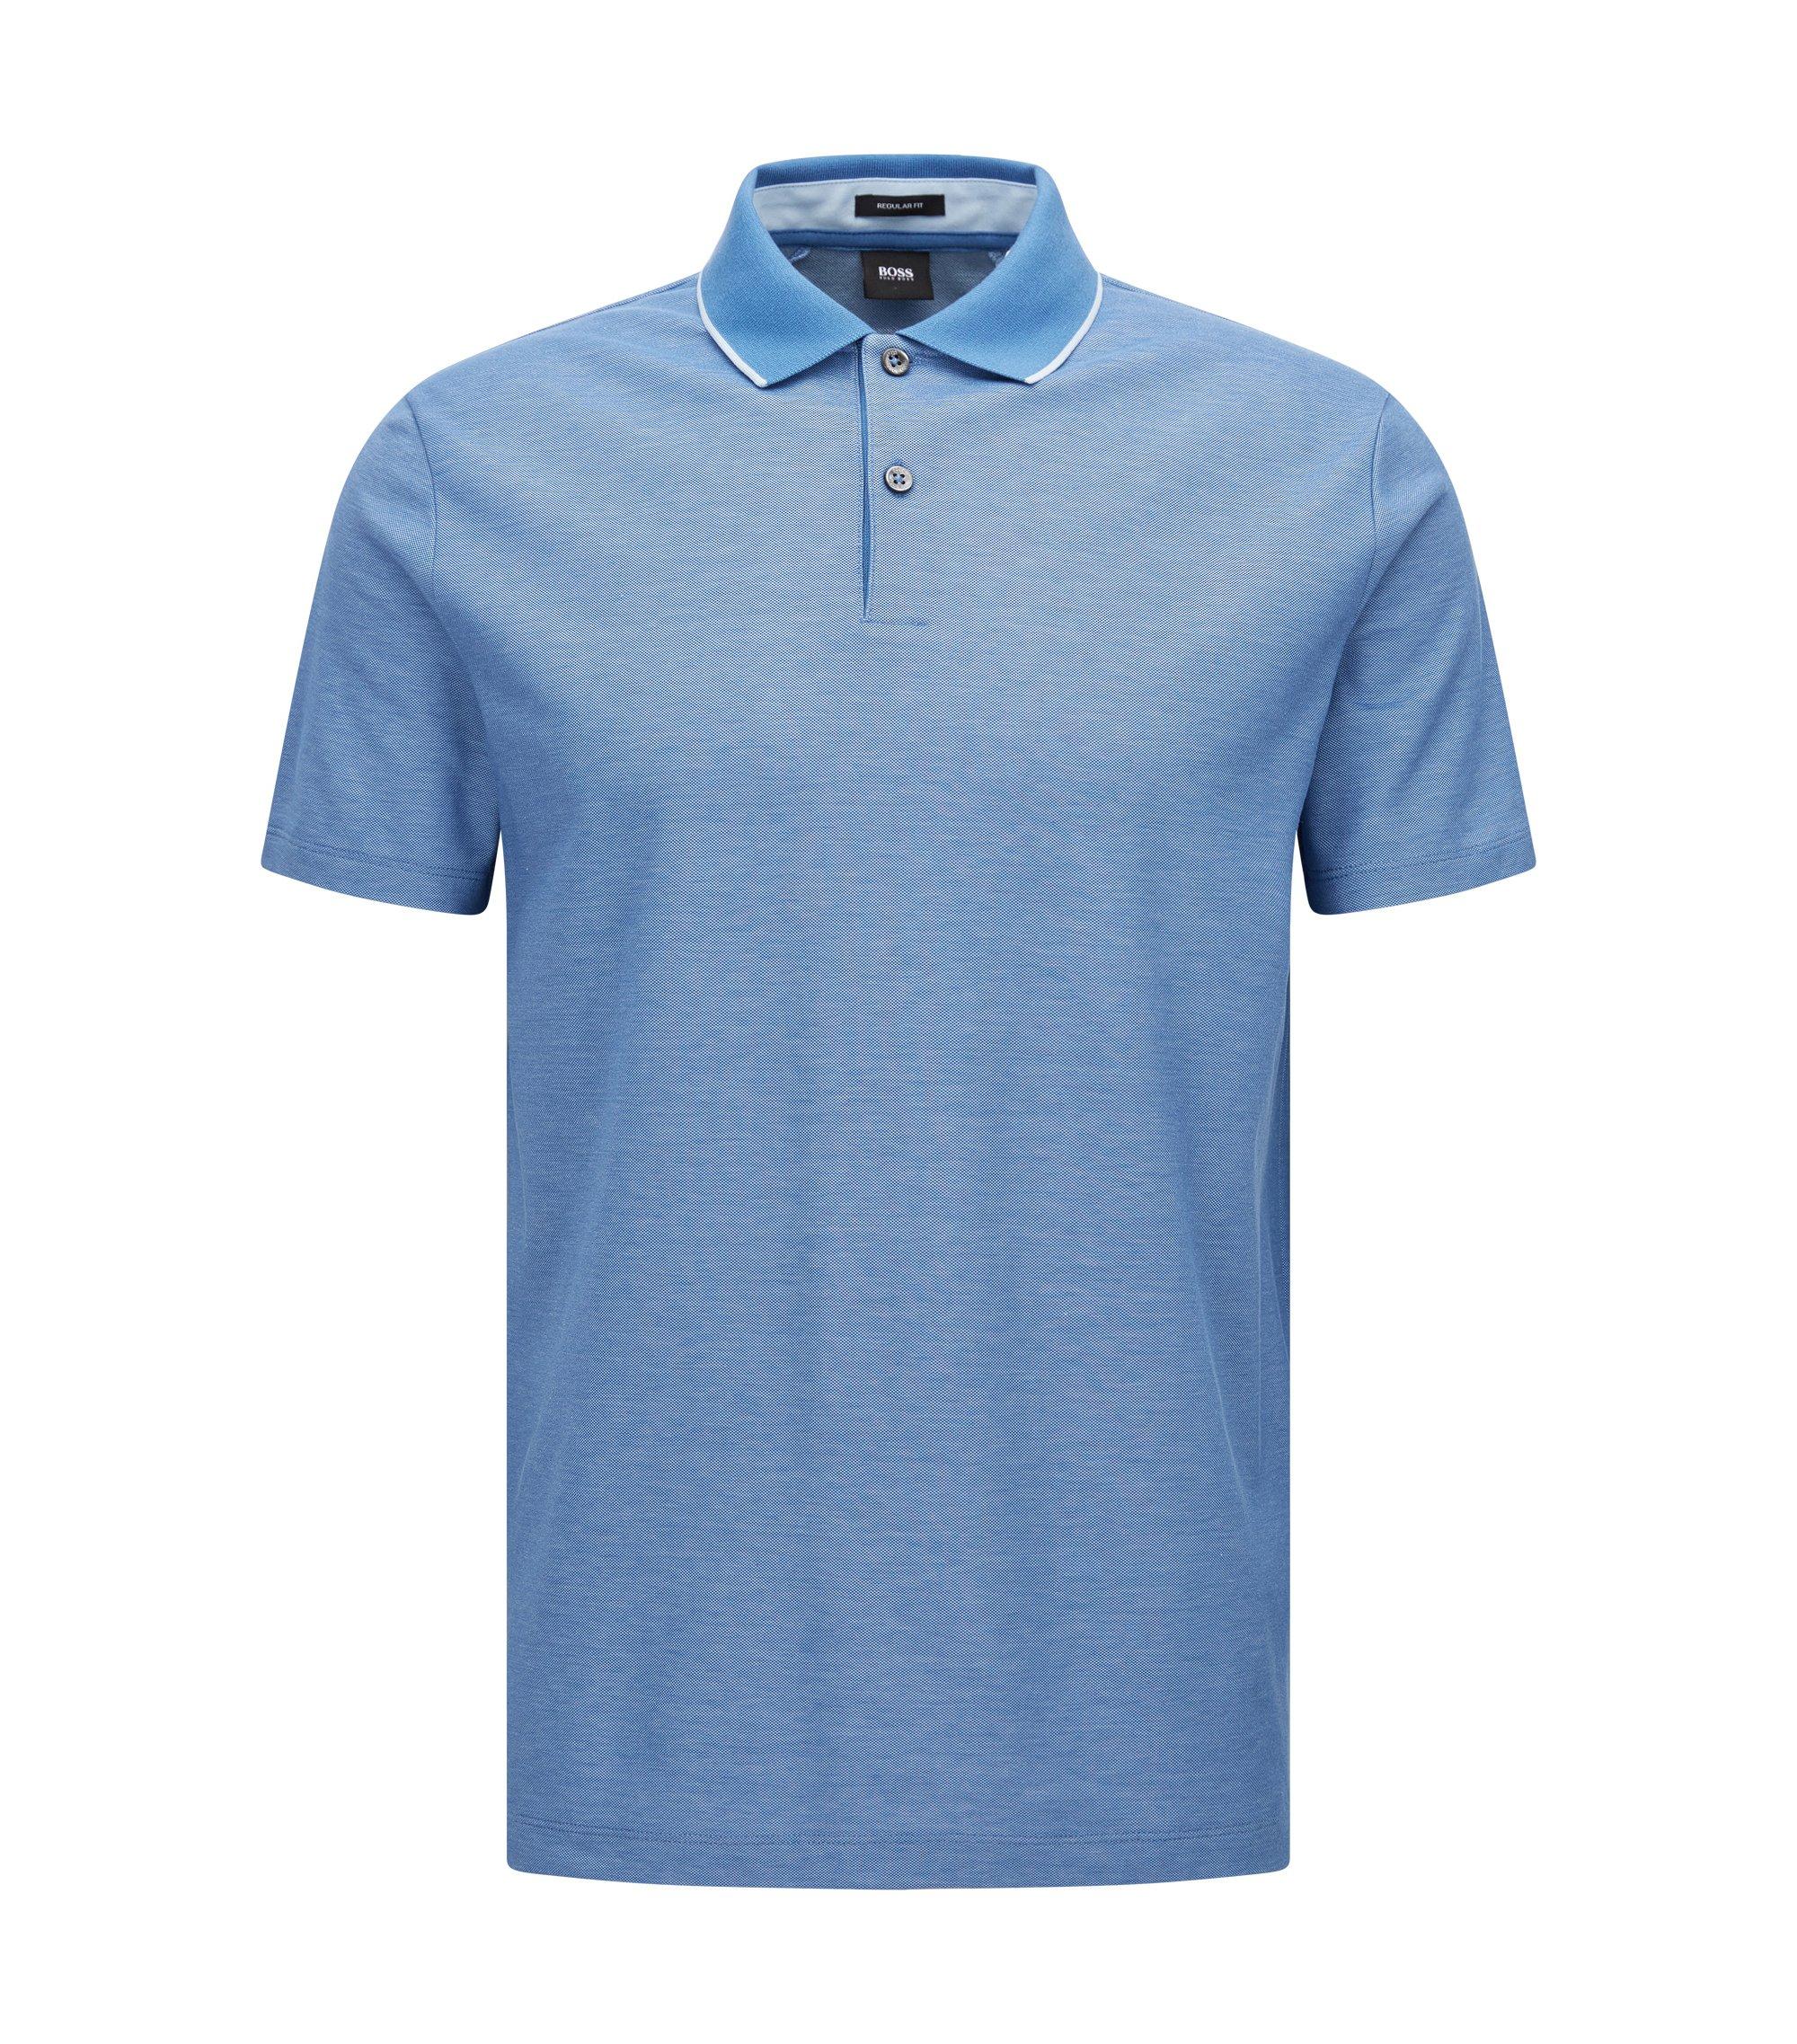 Regular-Fit Poloshirt aus melierter Baumwolle, Blau